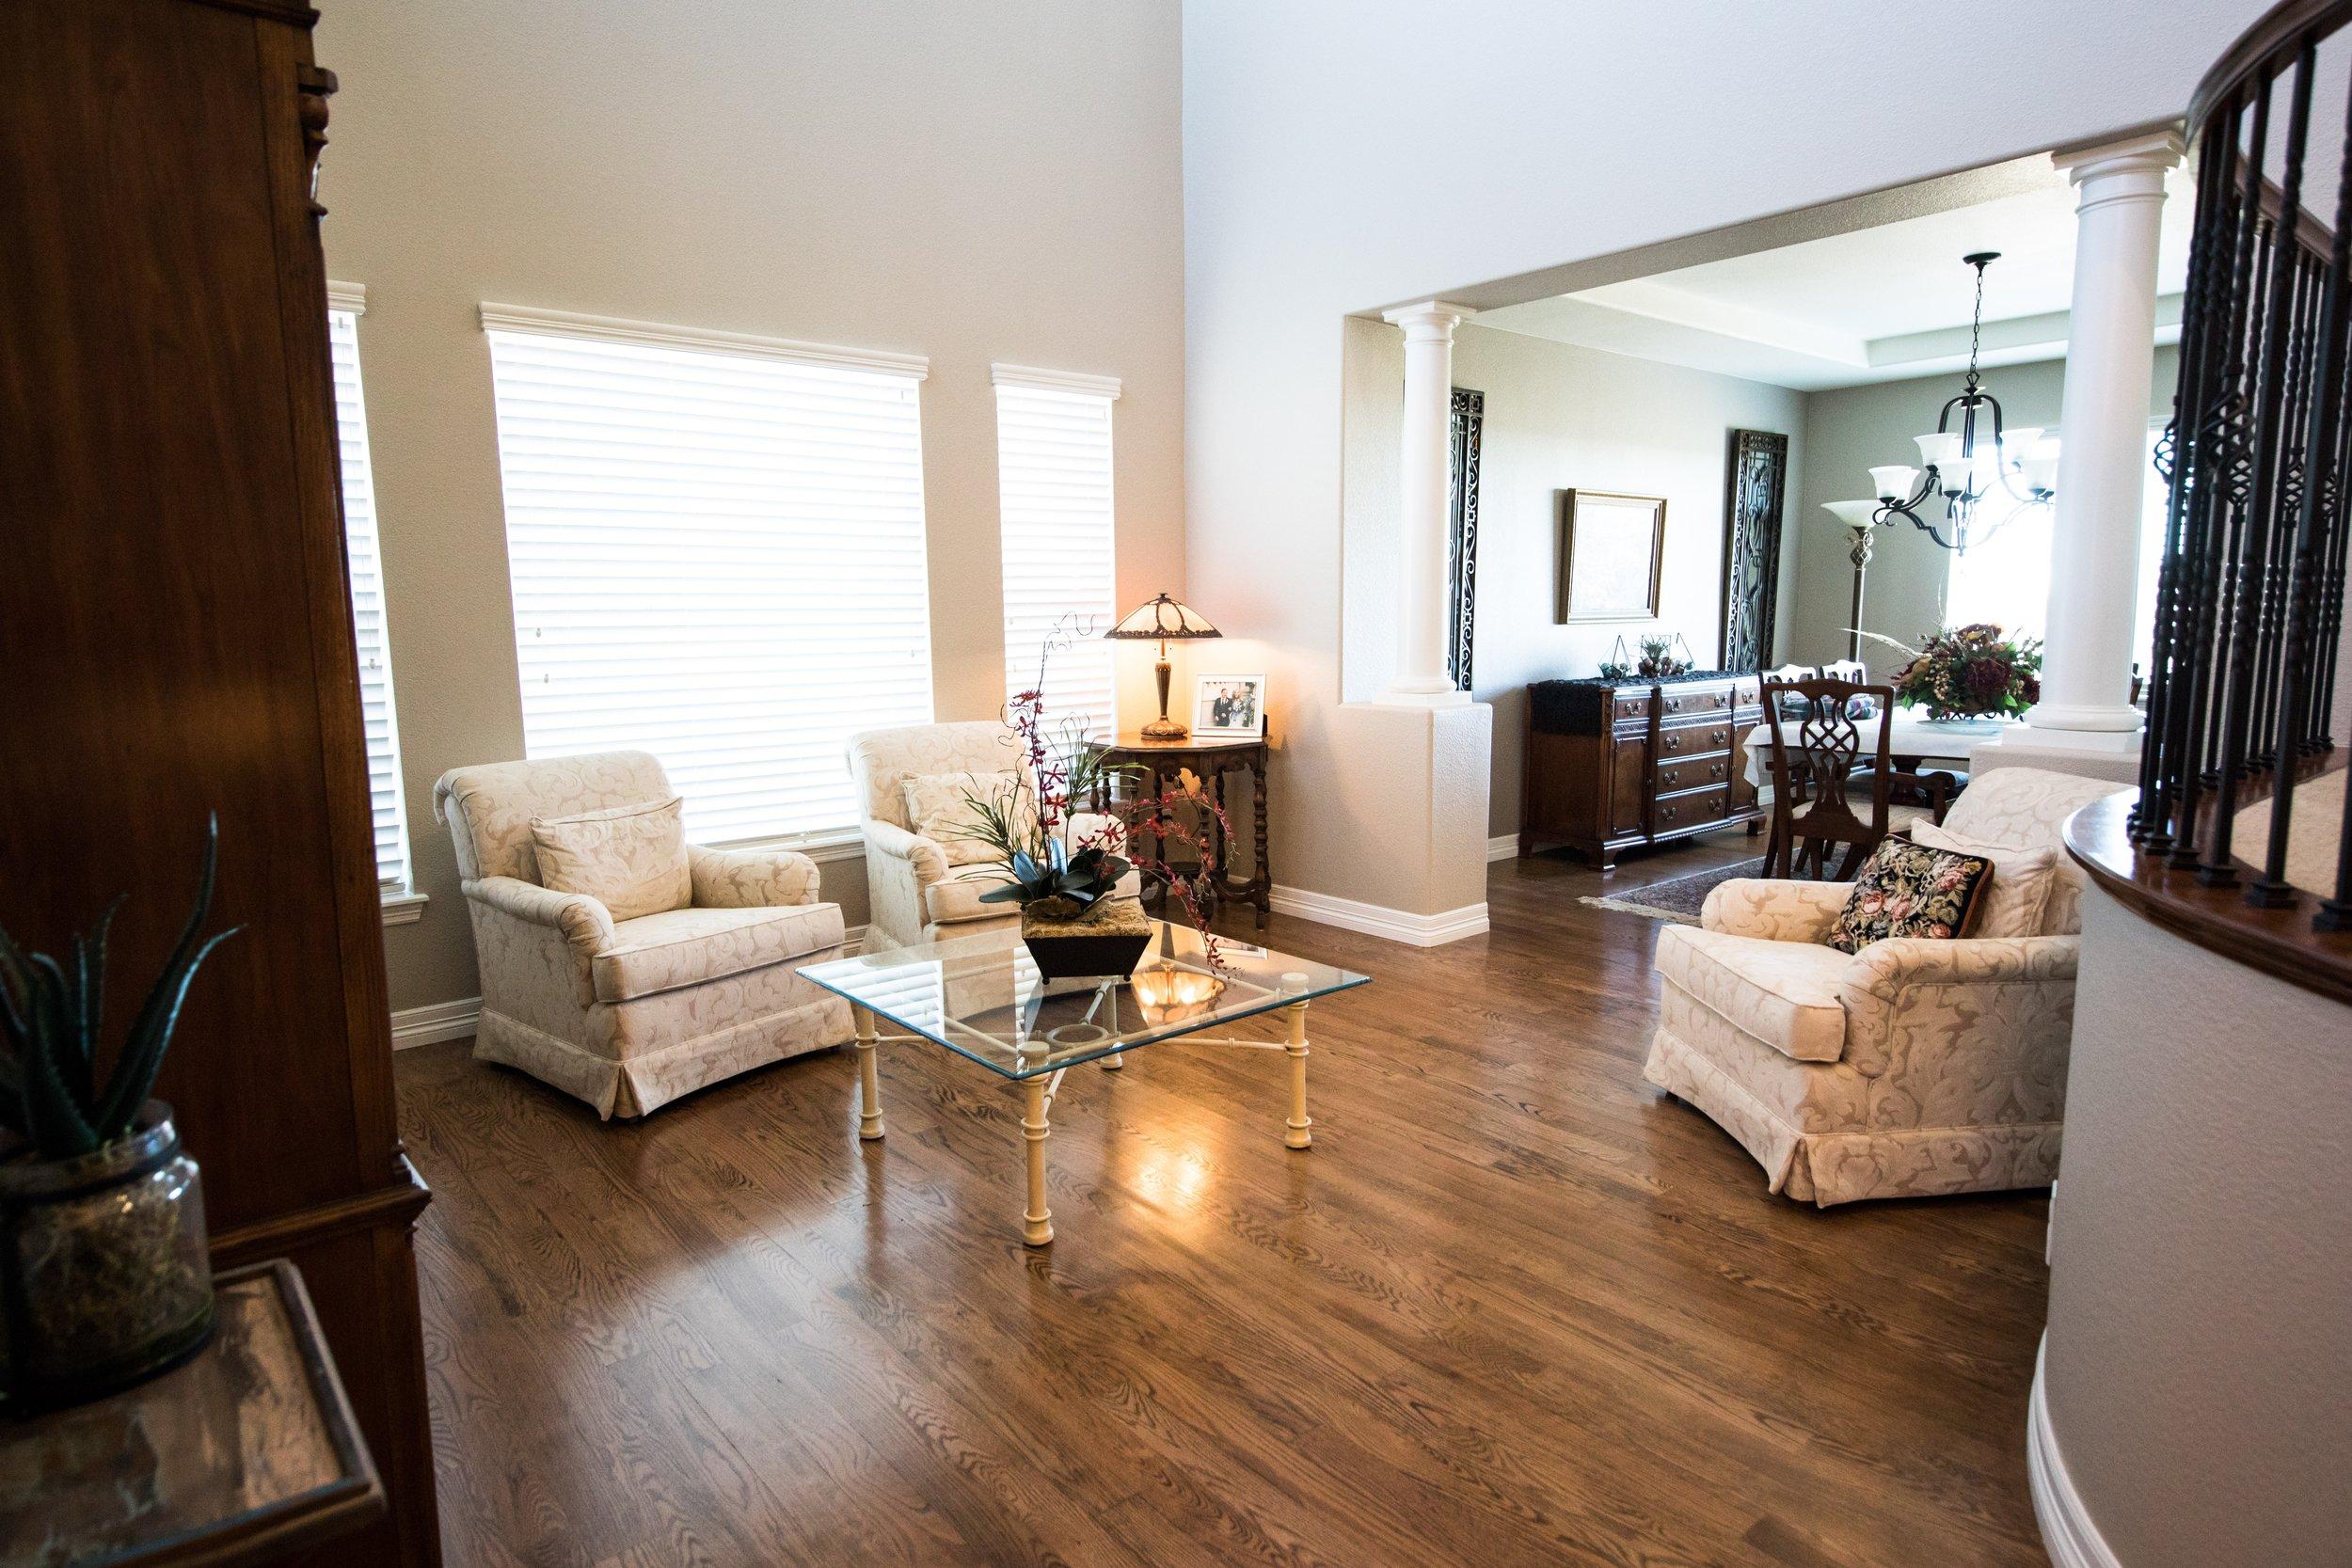 apartment-center-table-chair-2121120.jpg